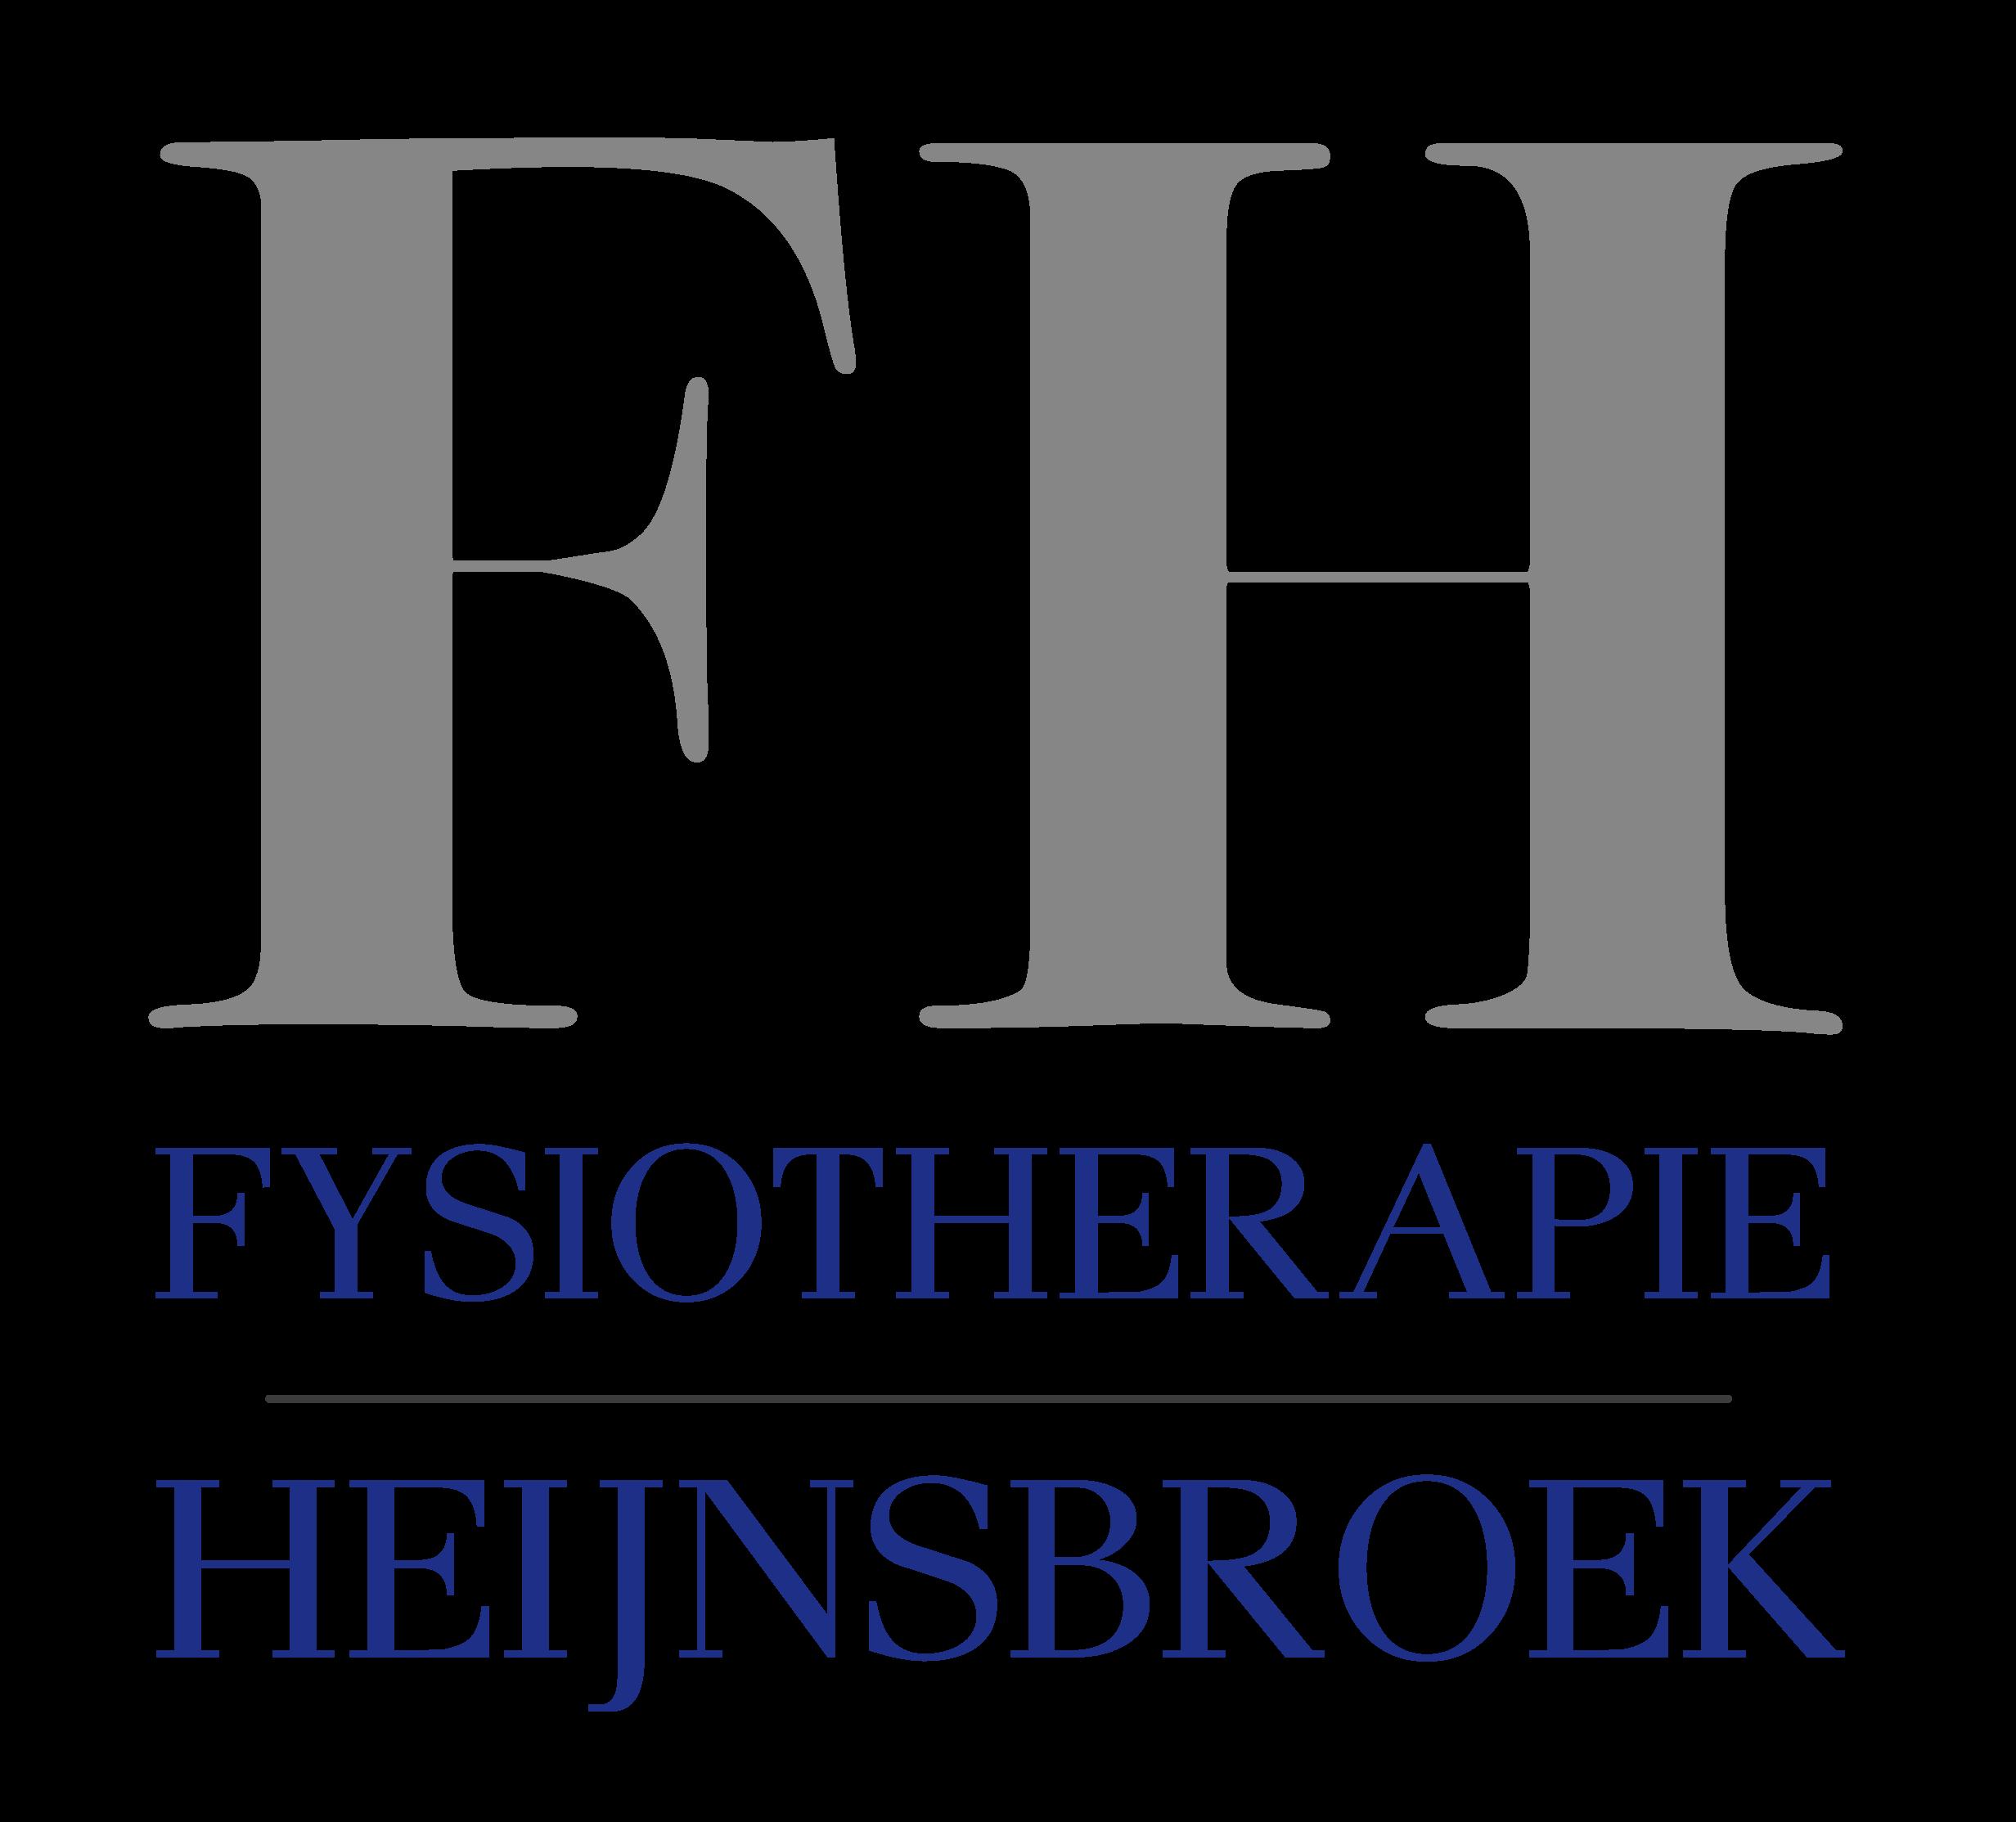 Fysiotherapie Heijnsbroek